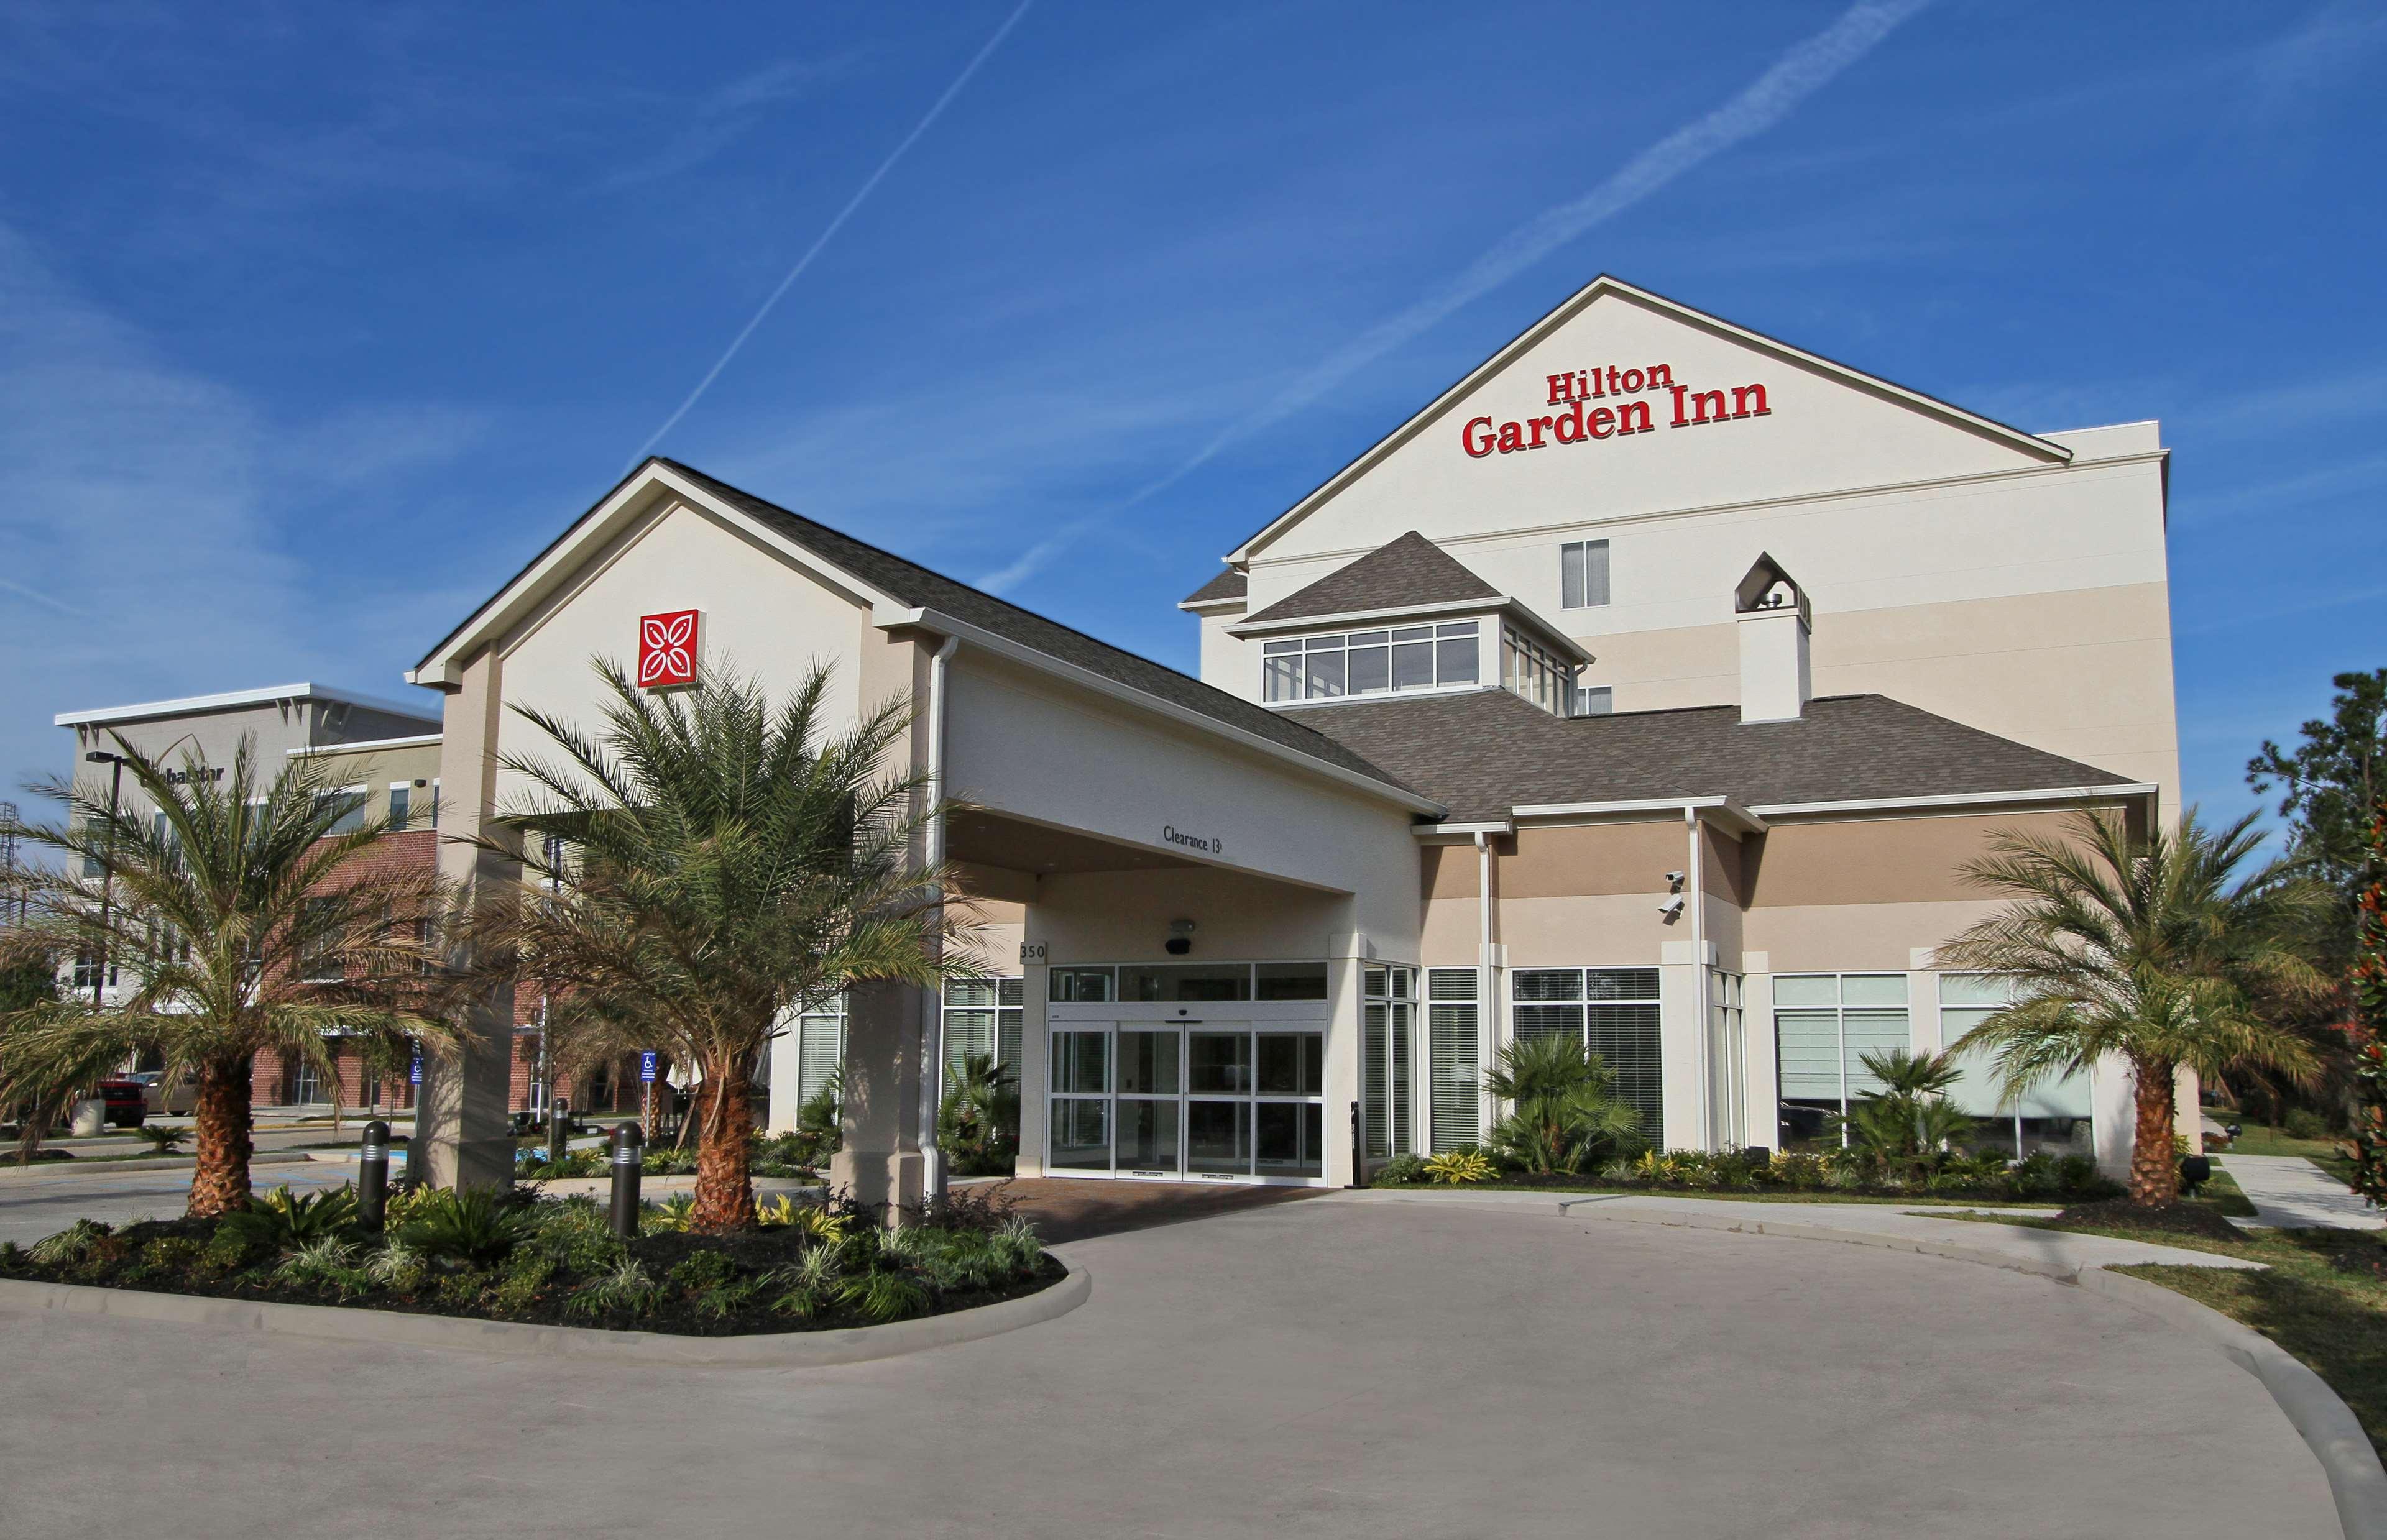 Hilton Garden Inn Covington/Mandeville image 2